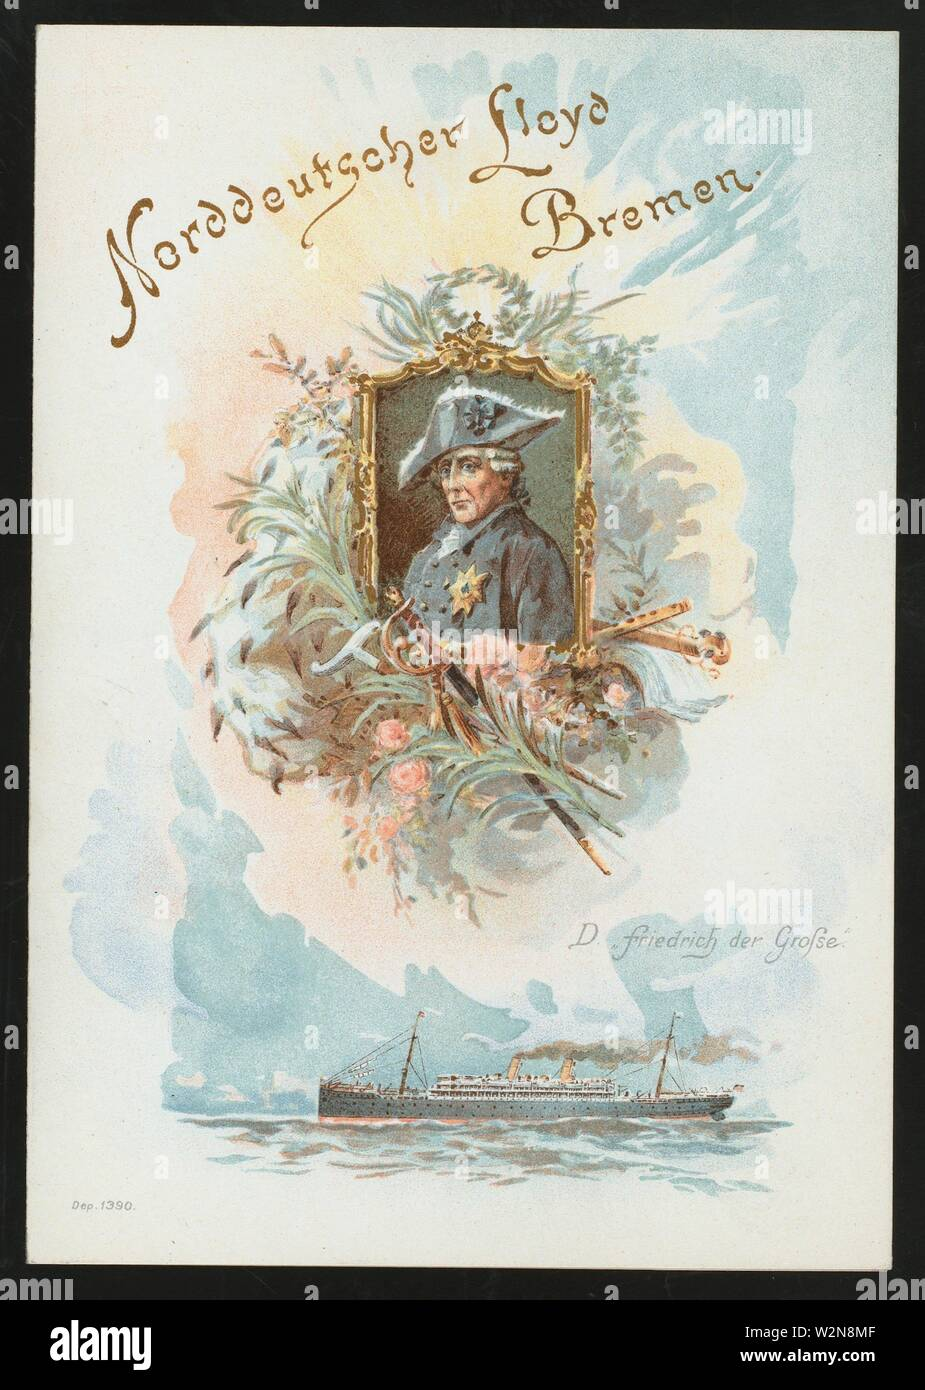 DINNER [held by] NORDEUTSCHER LLOYD BREMEN [at] EN ROUTE ABOARD SS FRIEDRICH DER GROSSE (SS;). Buttolph, Frank E., Miss (d. 1924) (Collector). The - Stock Image